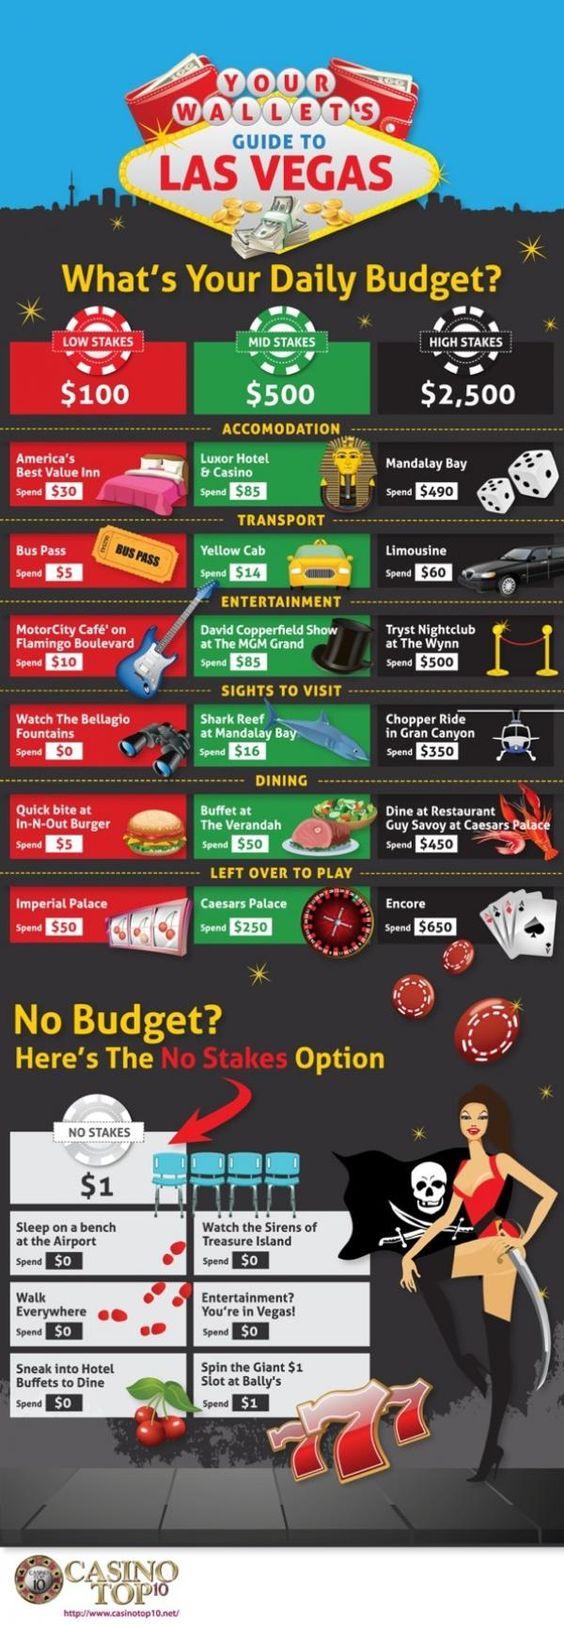 9007f1c9ec25196e4186c97a6d85502d - Gamblers Ask: Why Do I Need a Gambling Budget?